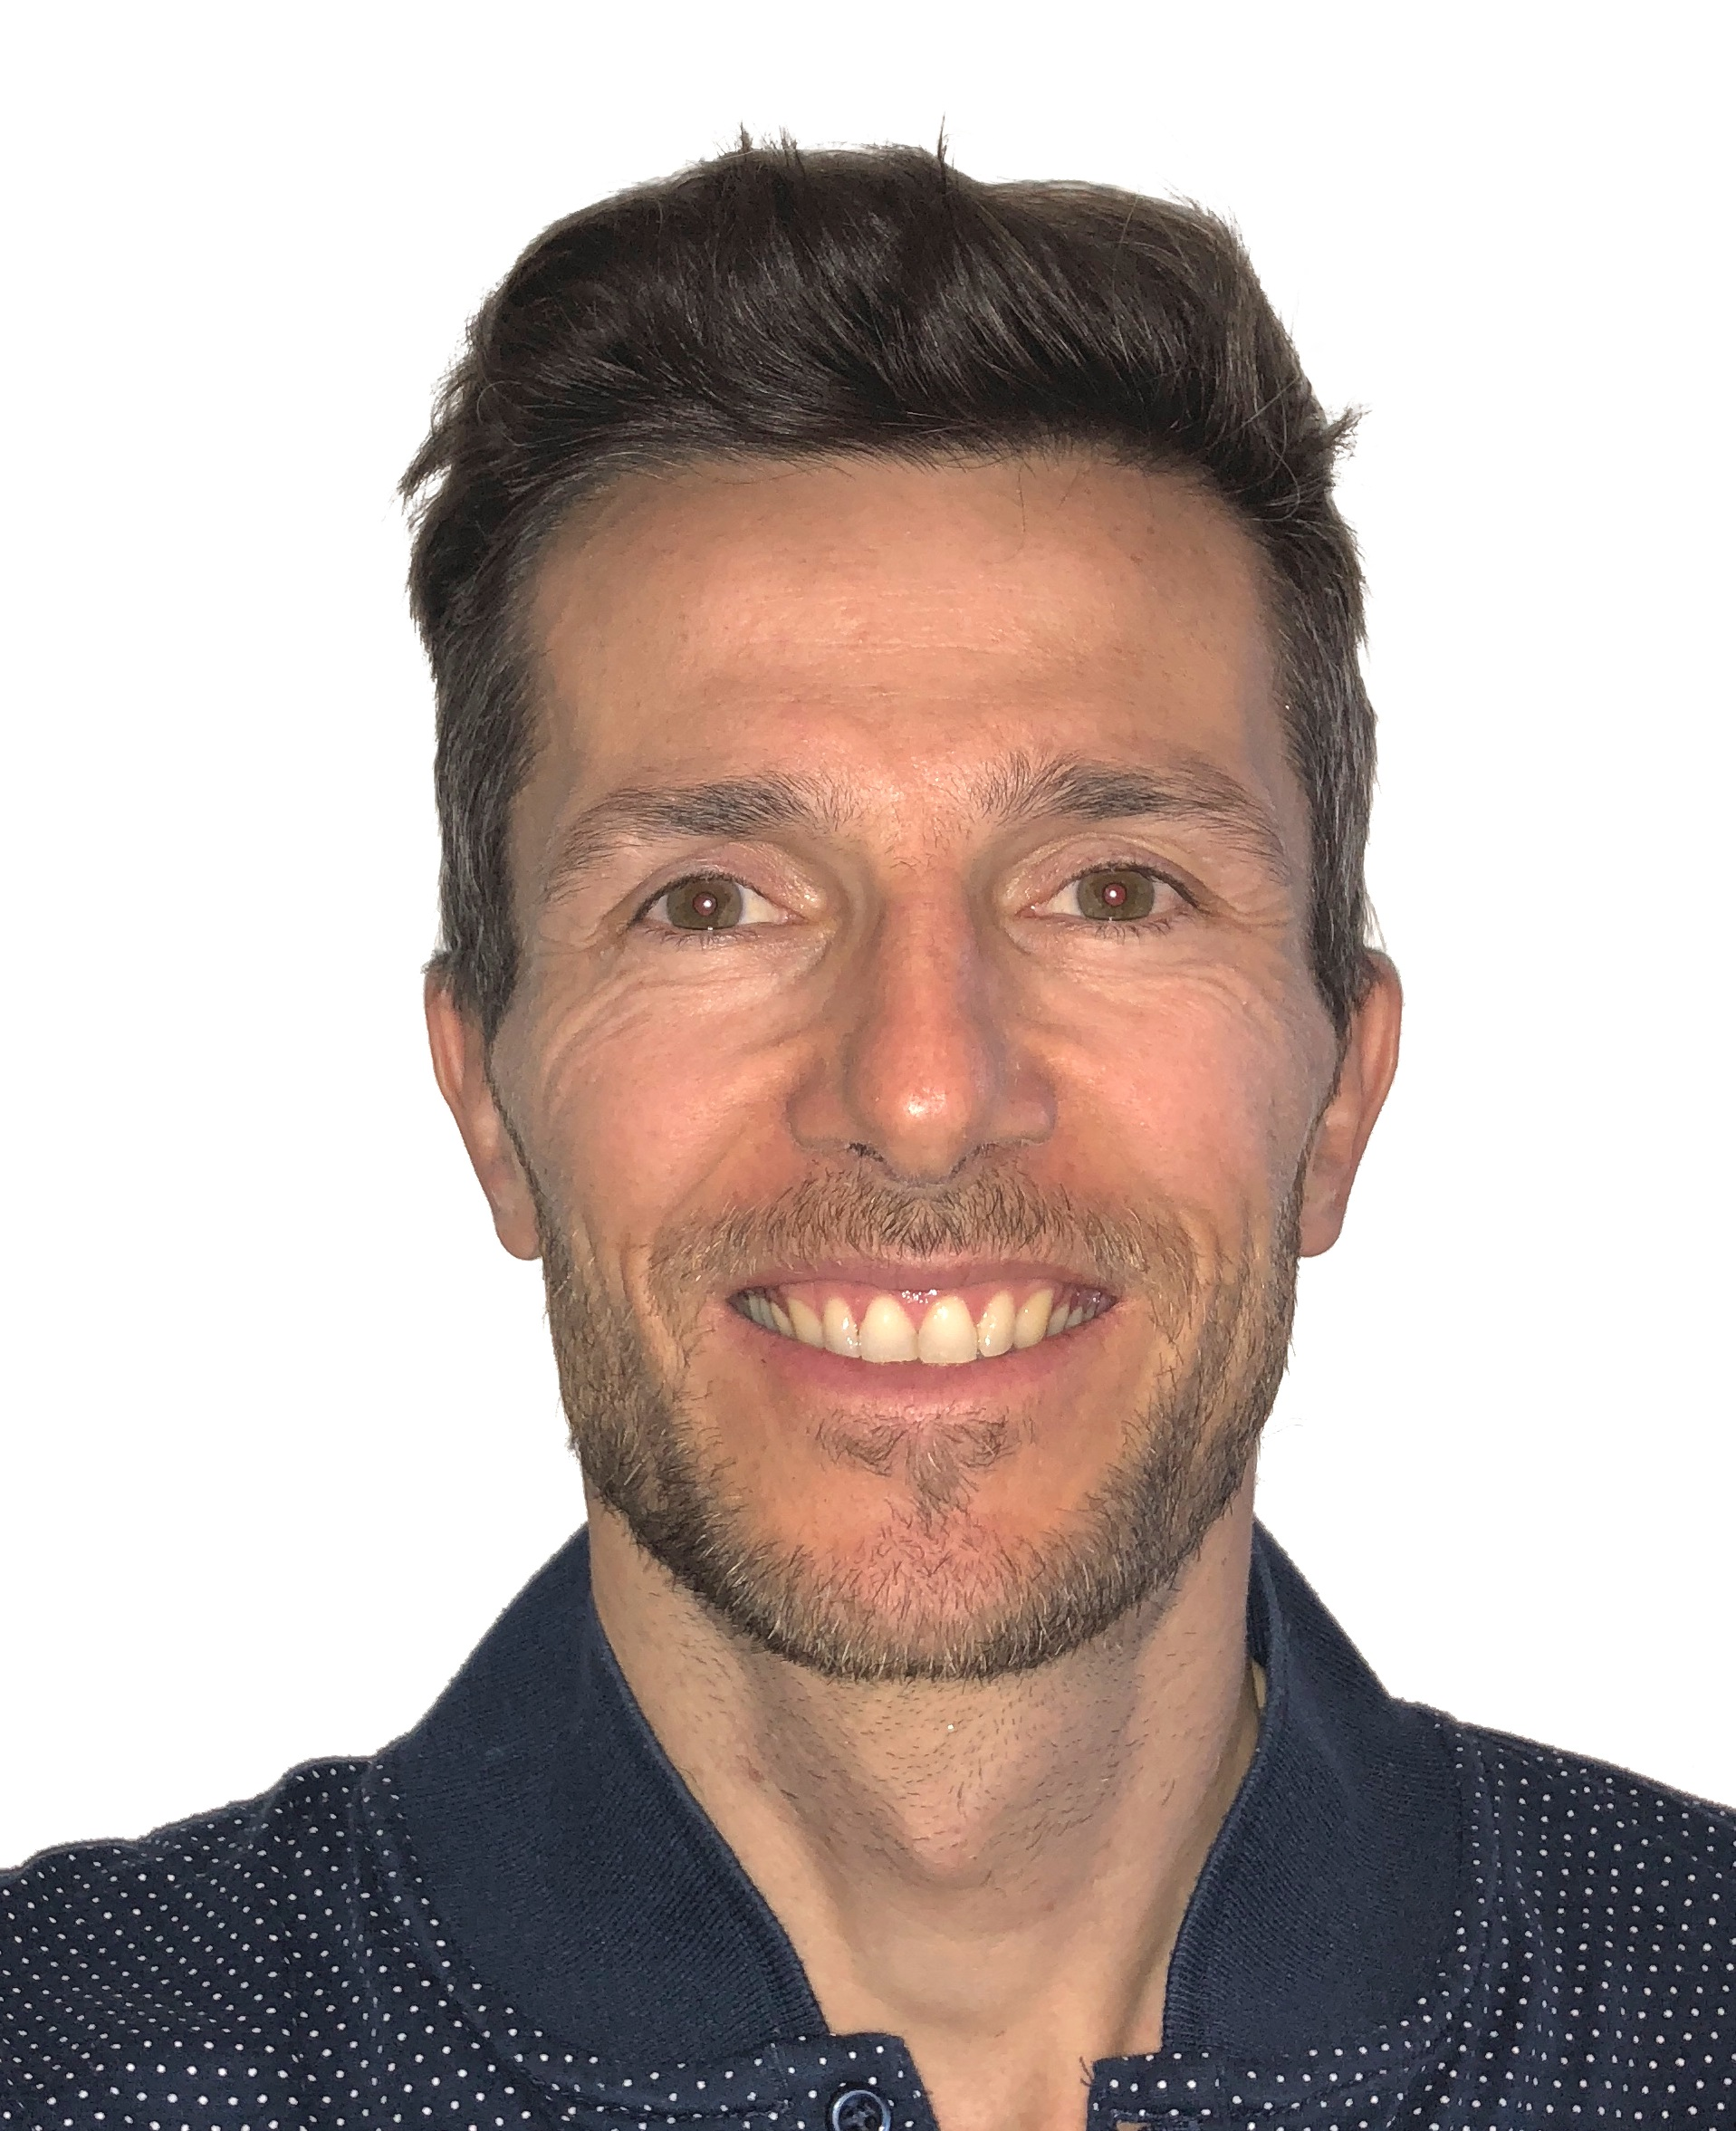 Thierry Miolane